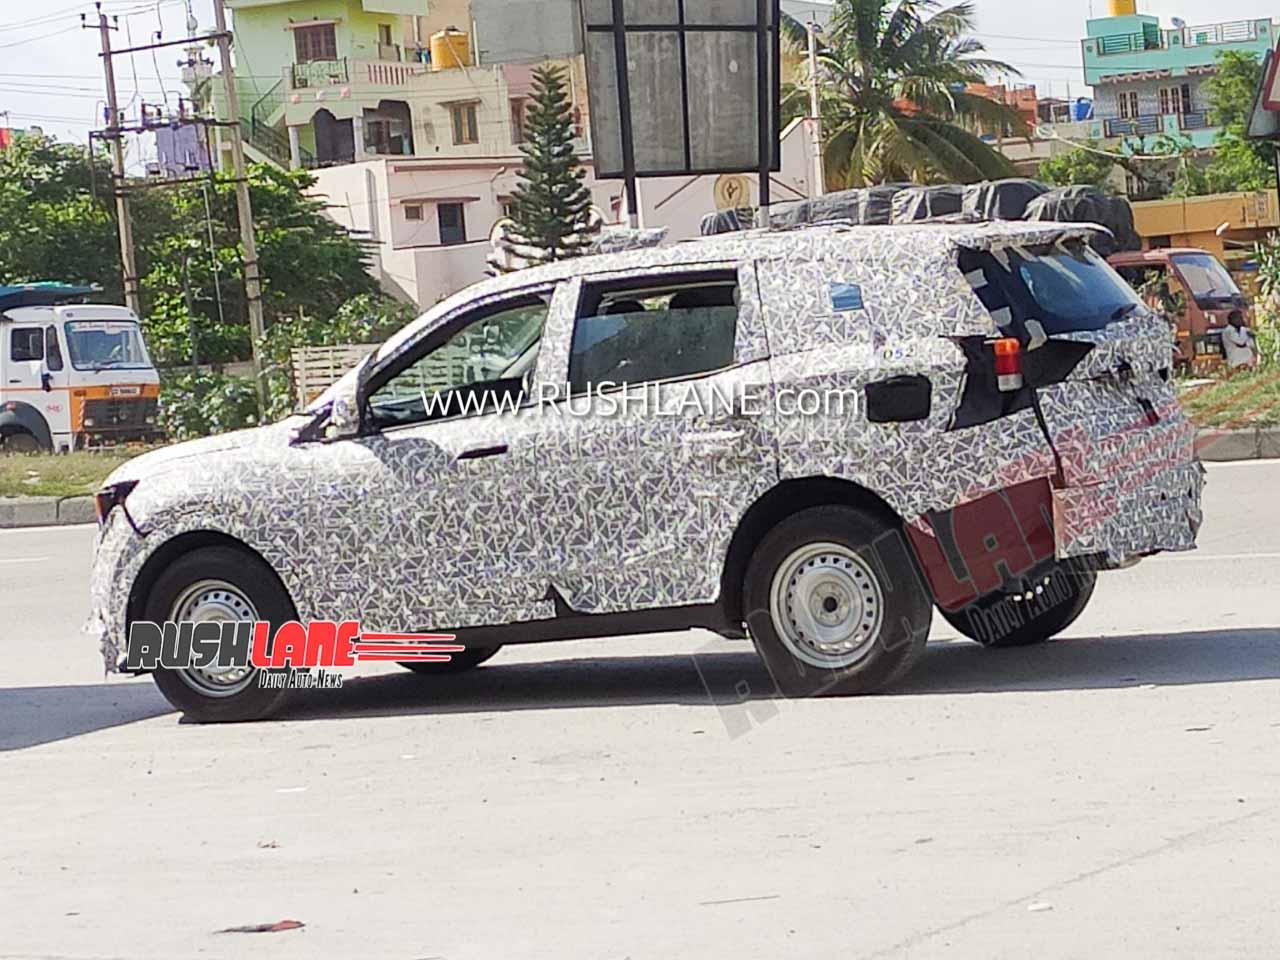 2021 Mahindra XUV500 spied testing yet again ahead of launch